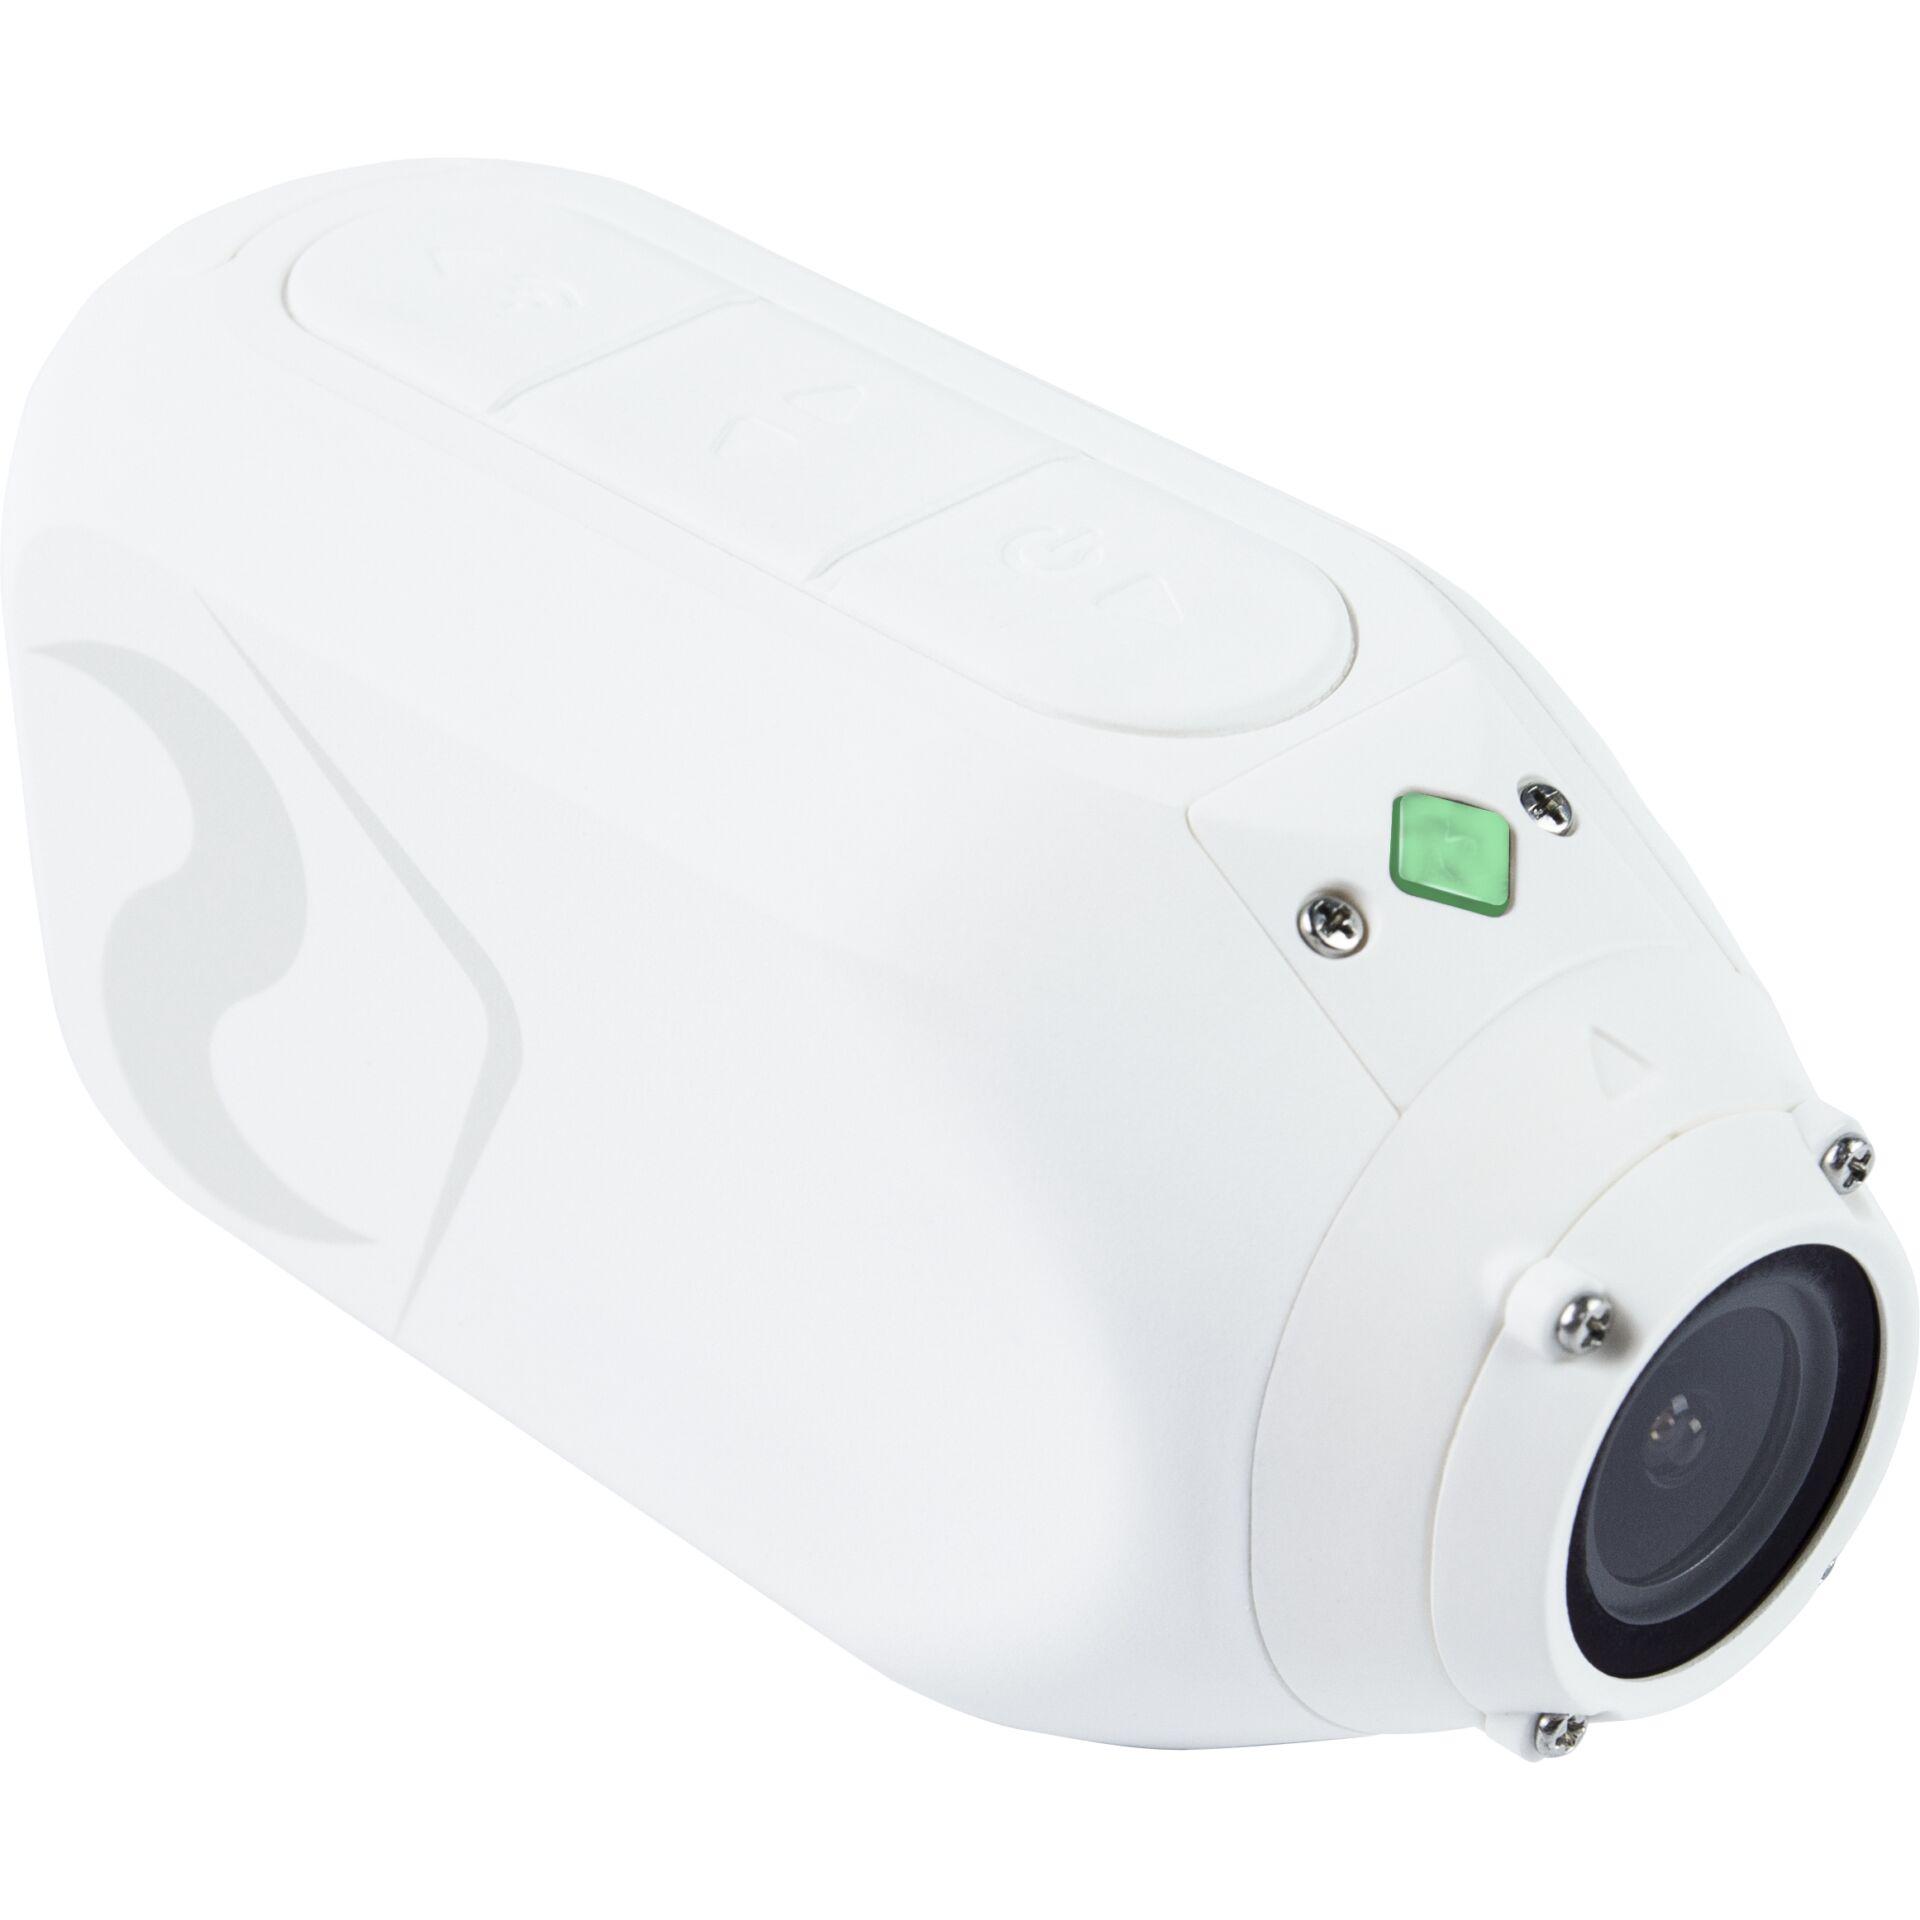 Drift Ghost XL SE (Snow Edition)